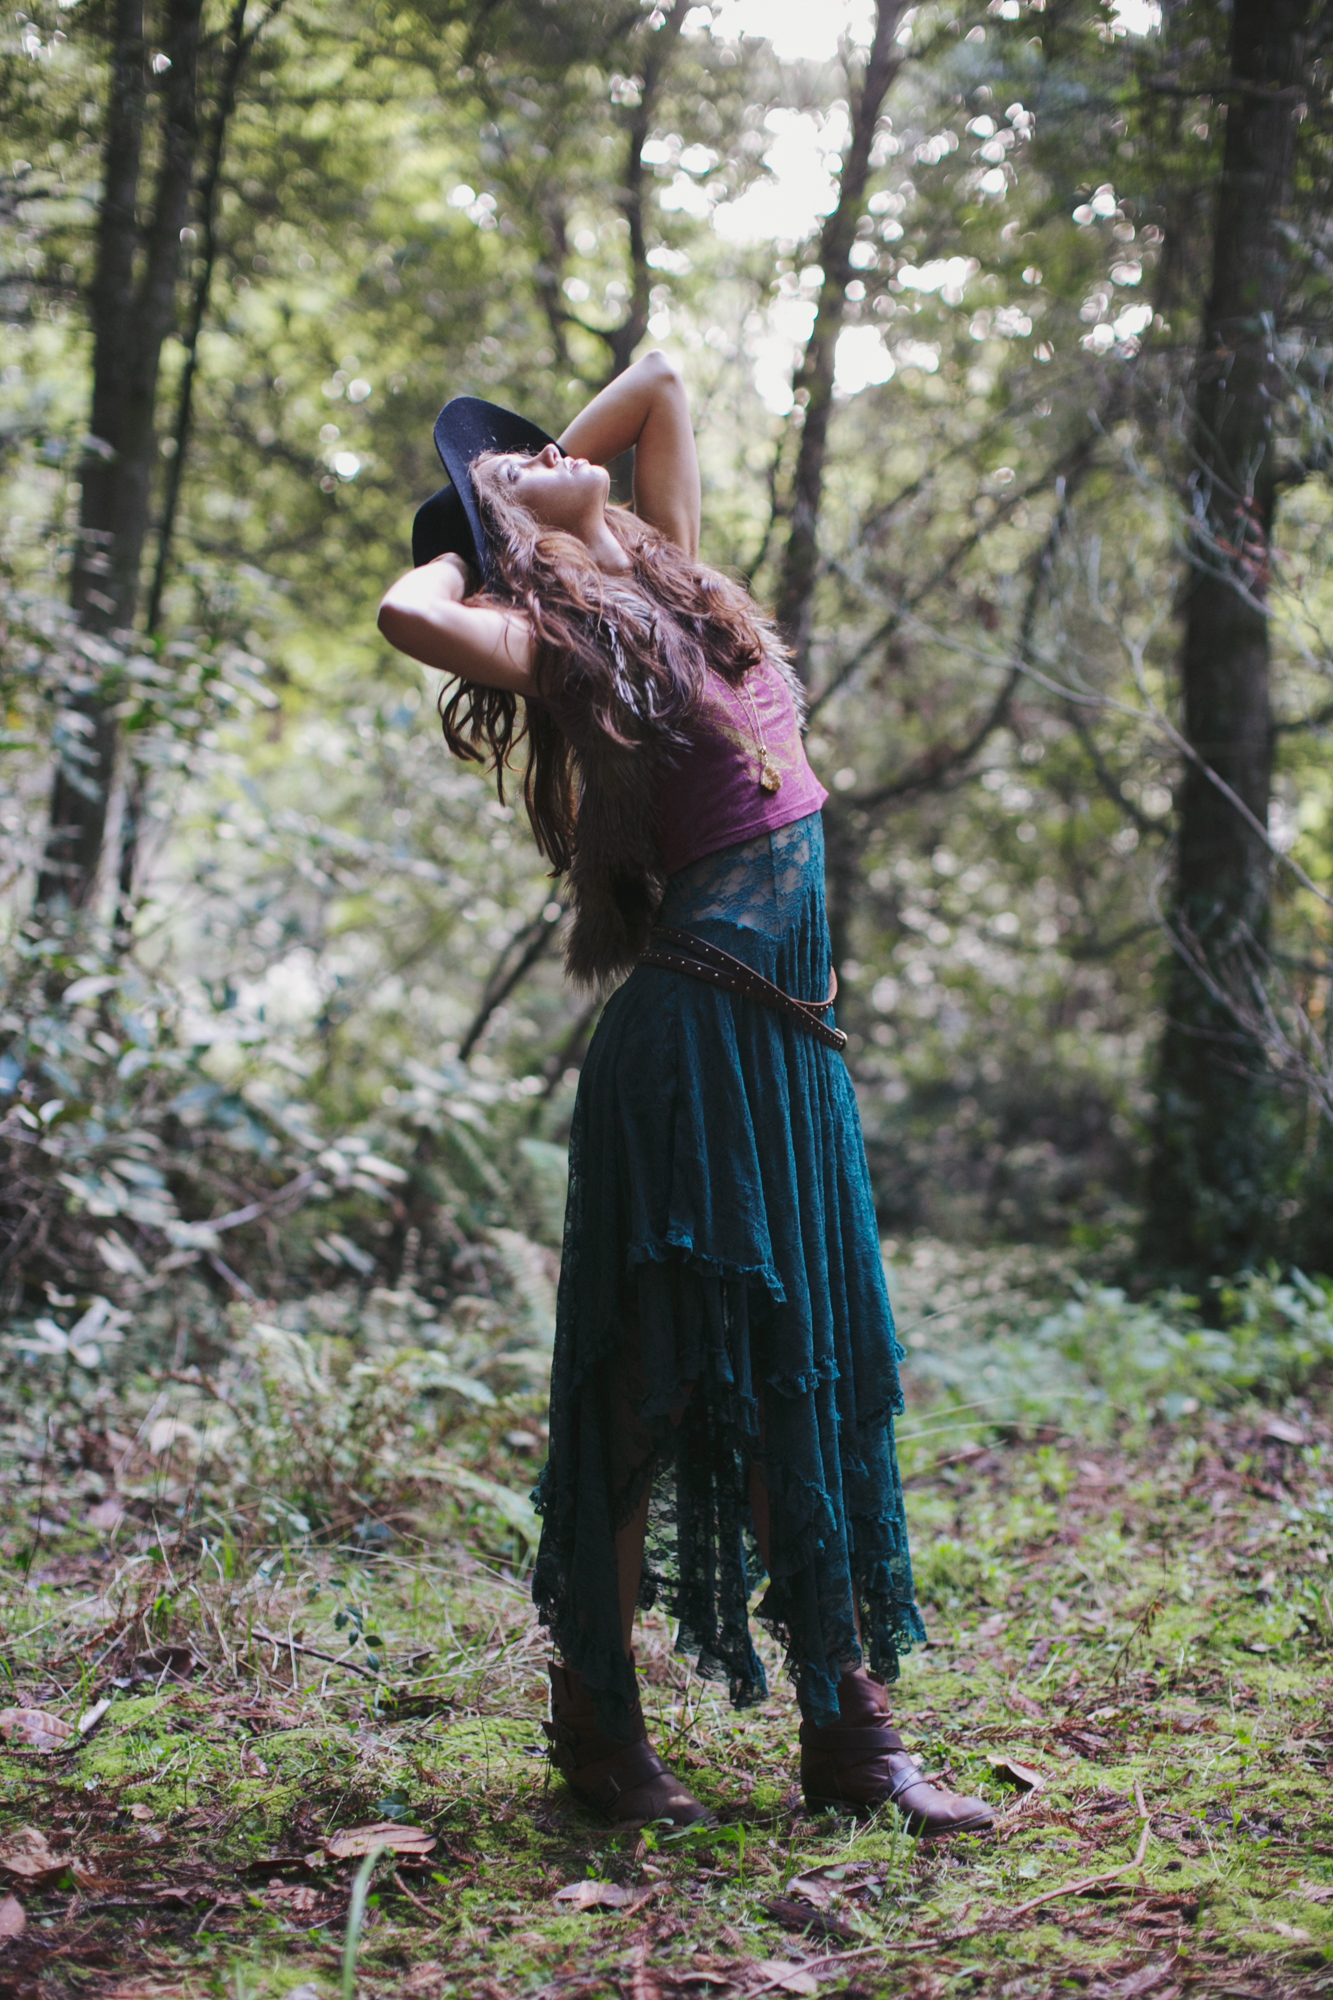 Fashion Photographer, Jennifer Skog's seductive & playful version of Cabin Fever.